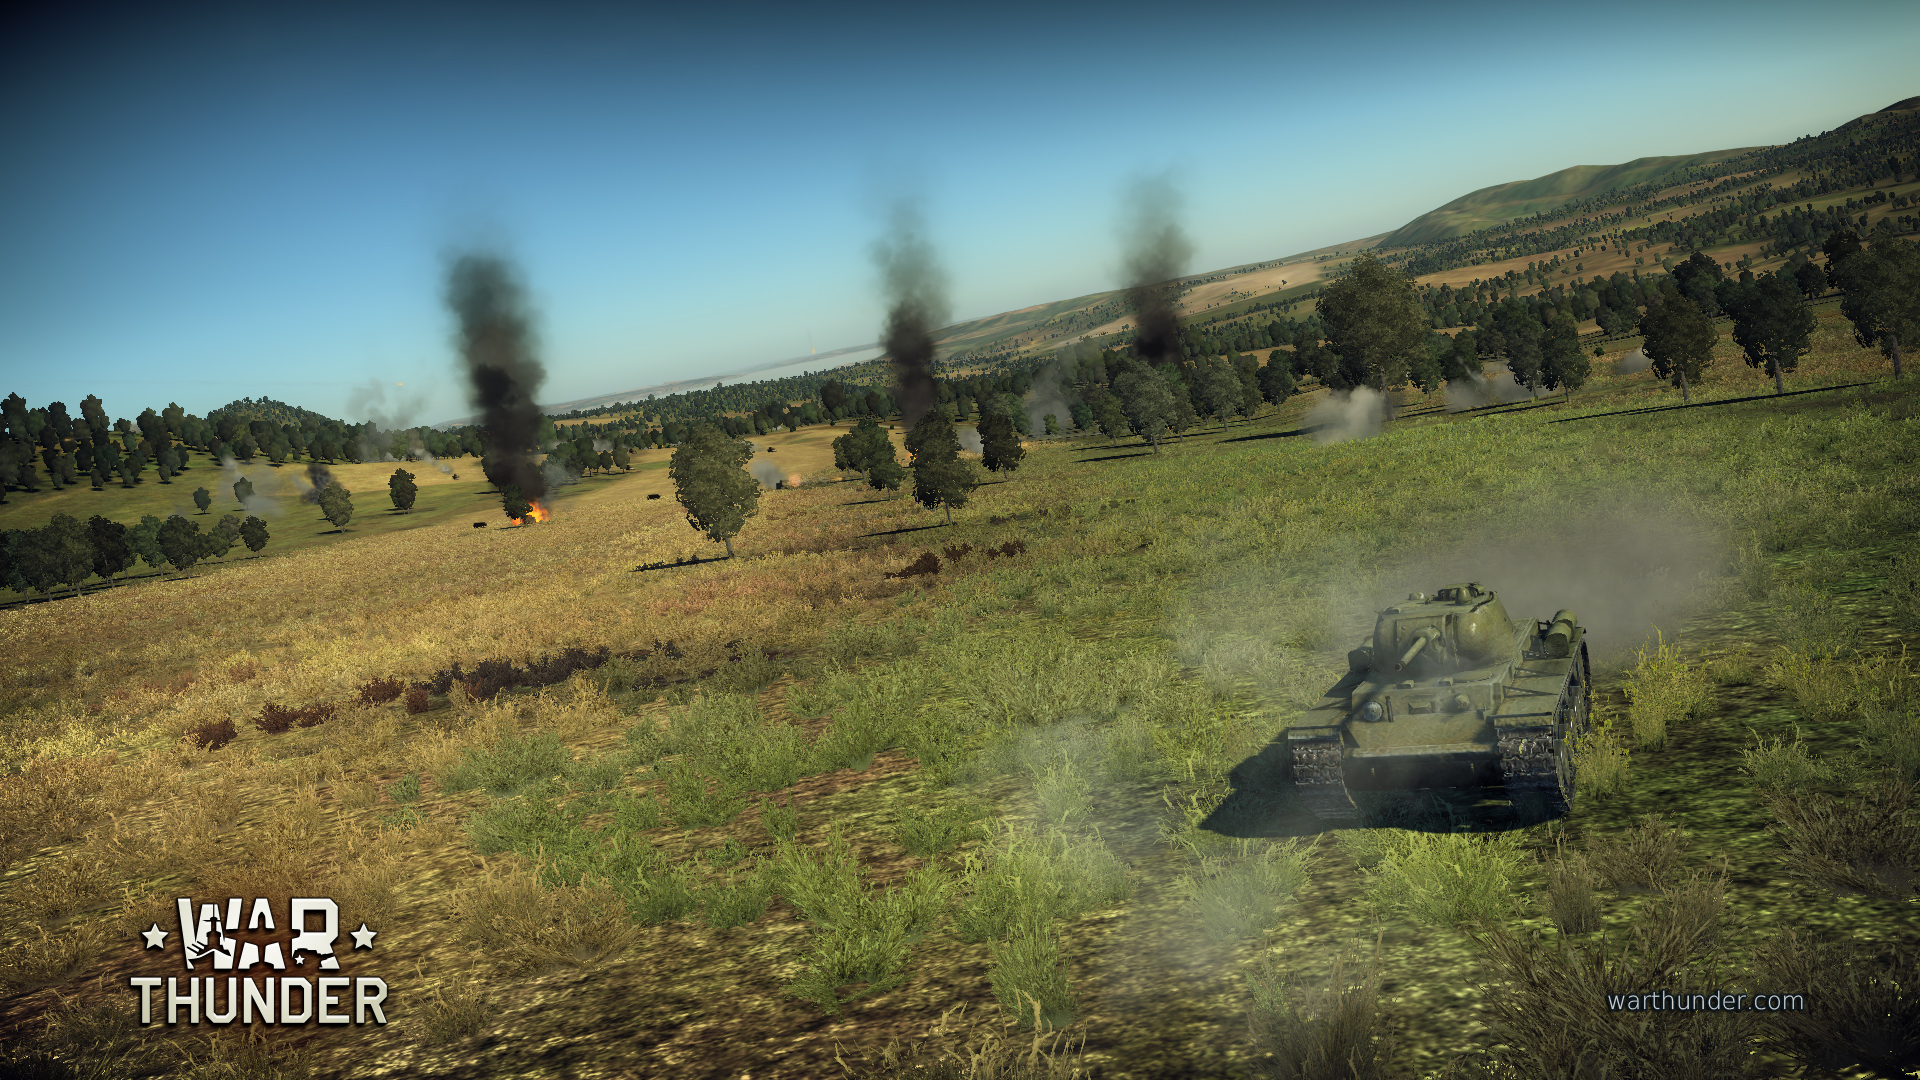 http://warthunder.ru/upload/image/media/screenshots/war_thunder_screen15.jpg